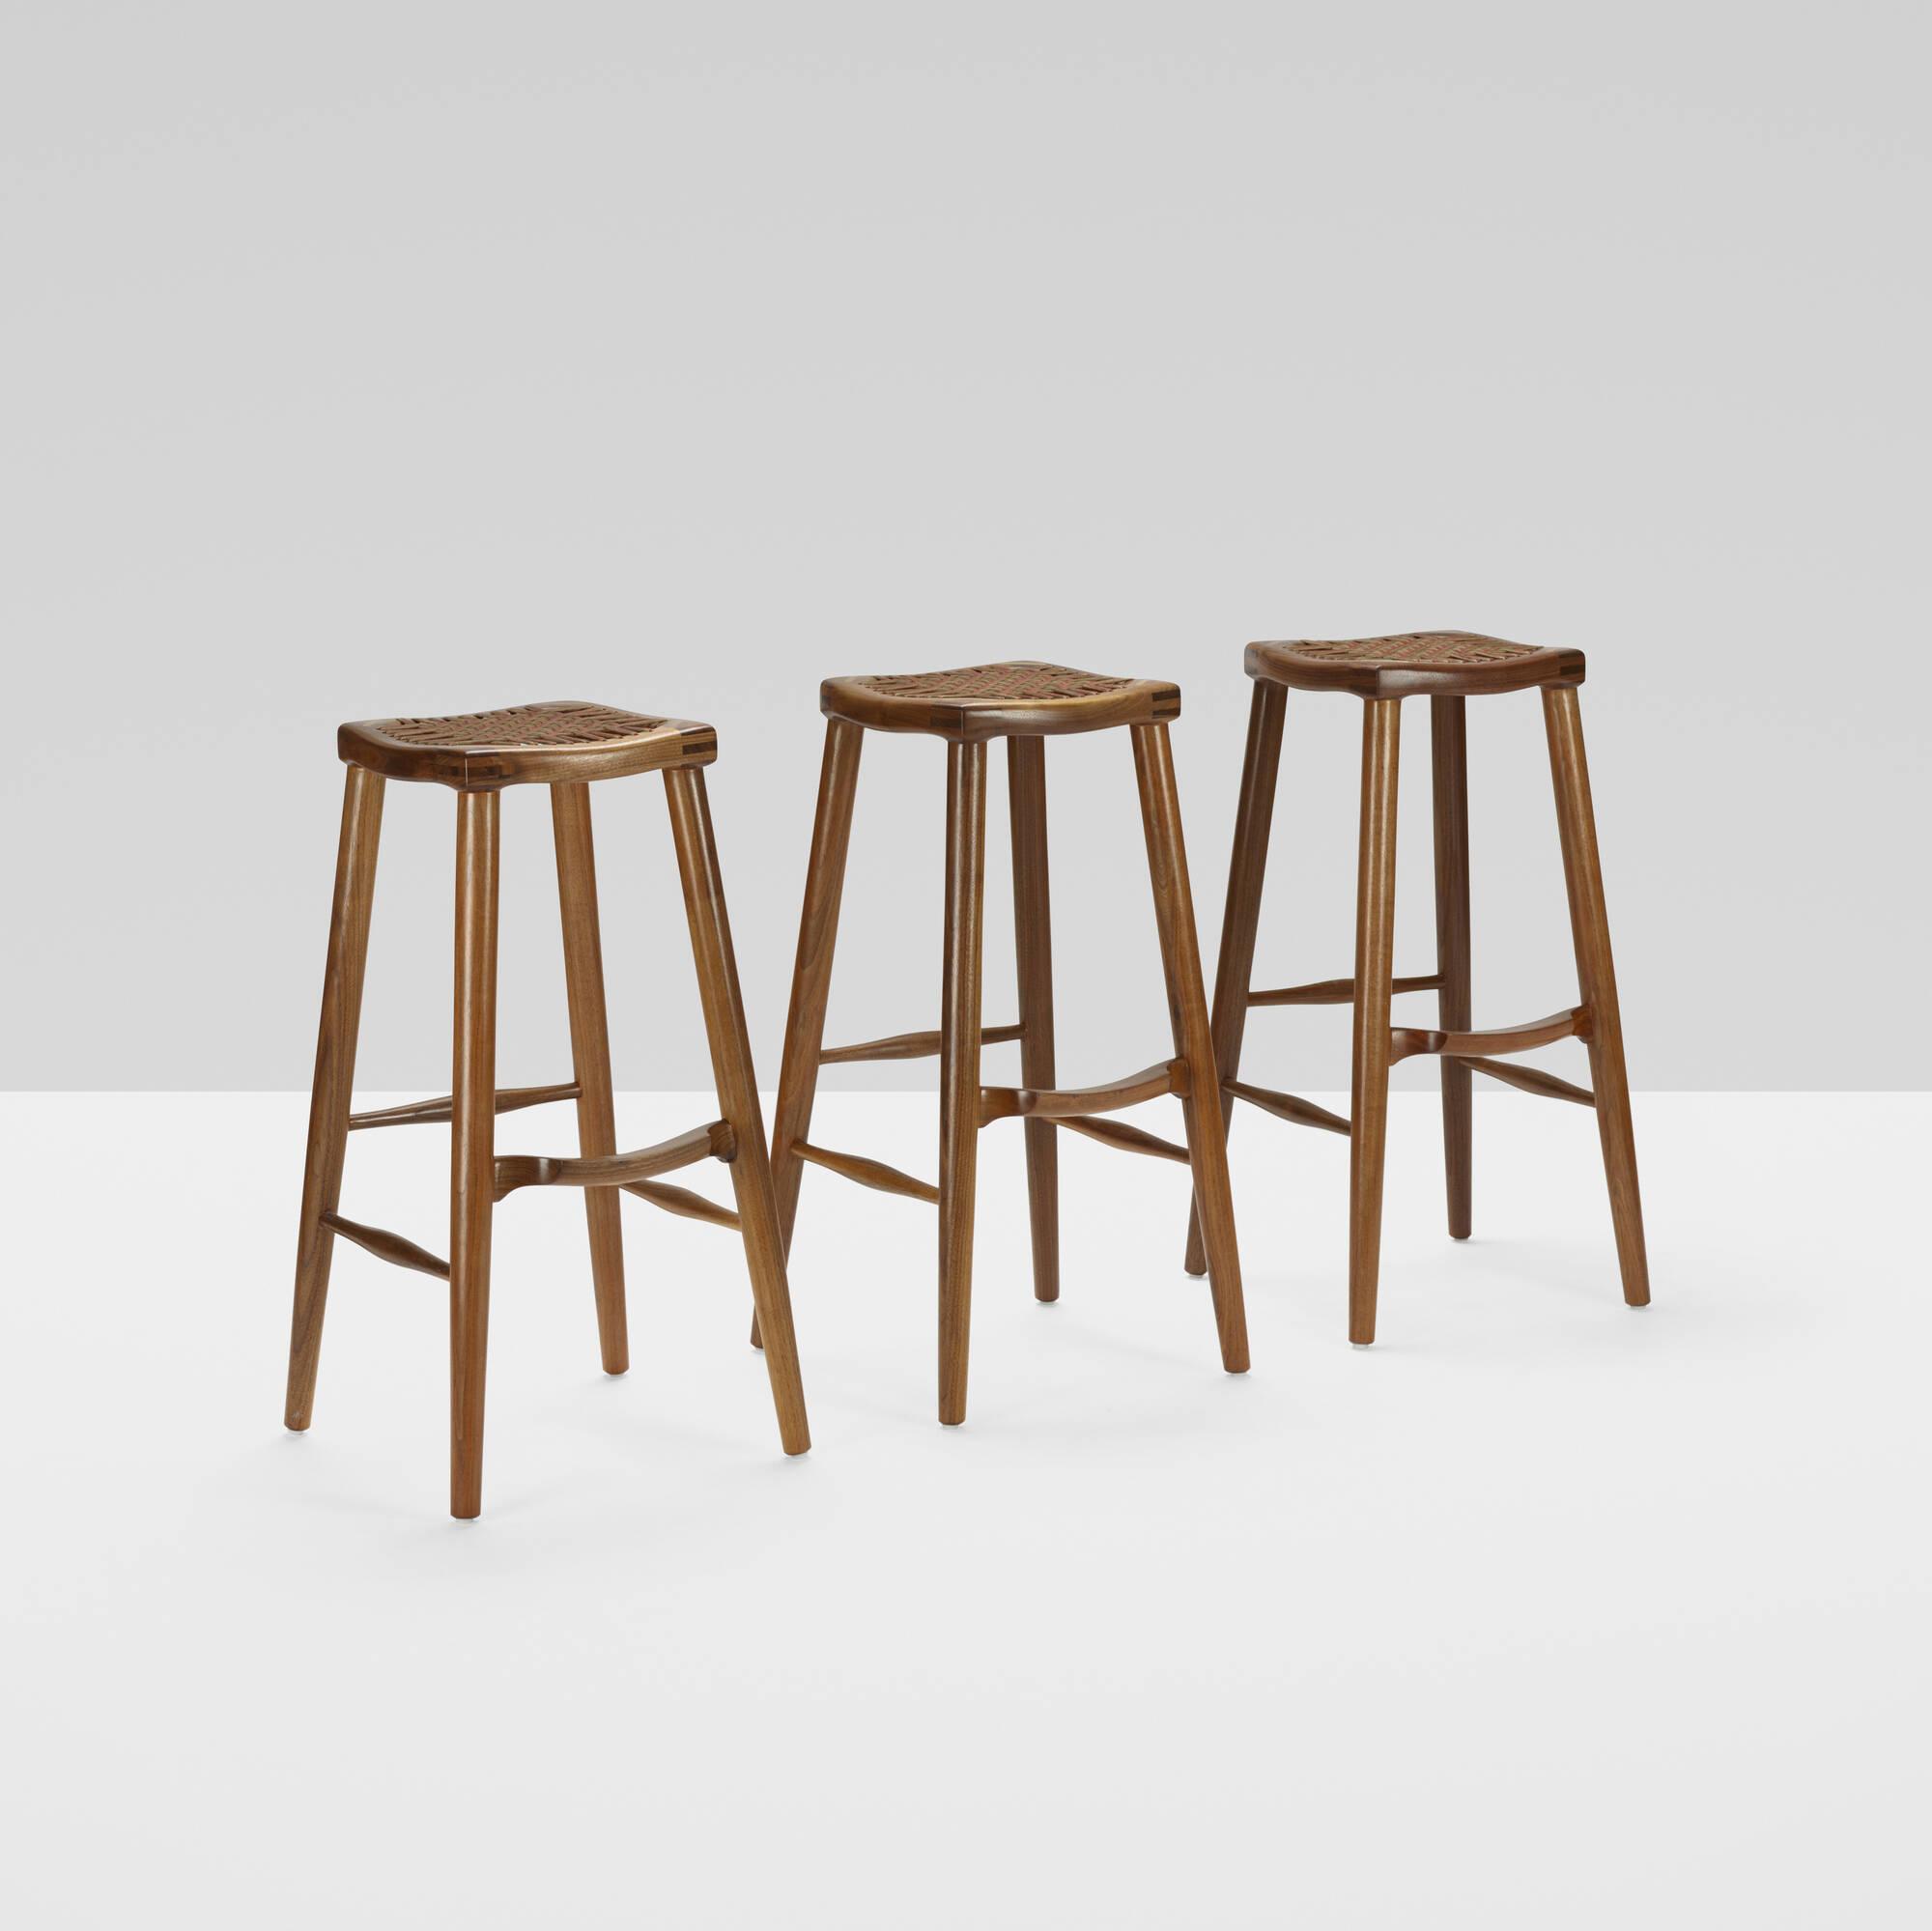 179: Sam Maloof / bar stools, set of three (2 of 4)